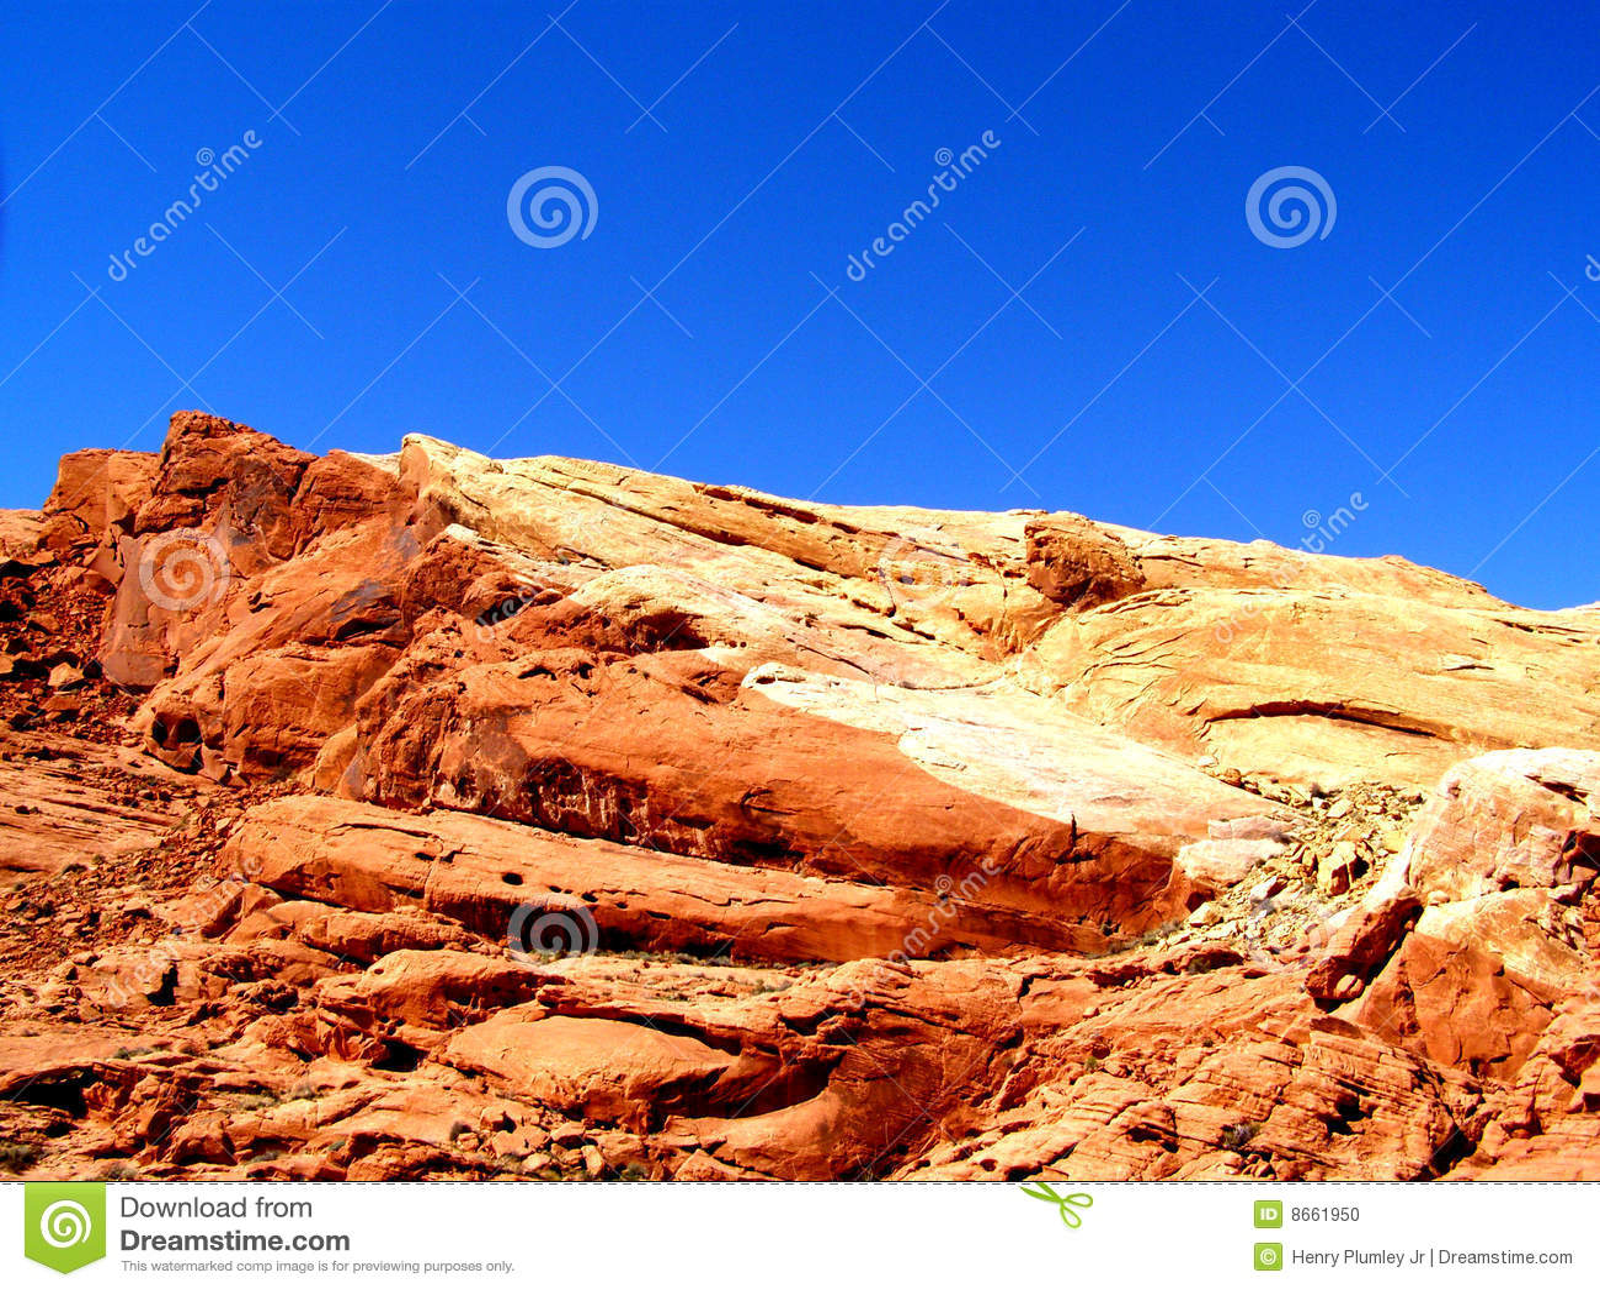 Empreinte digitale de désert